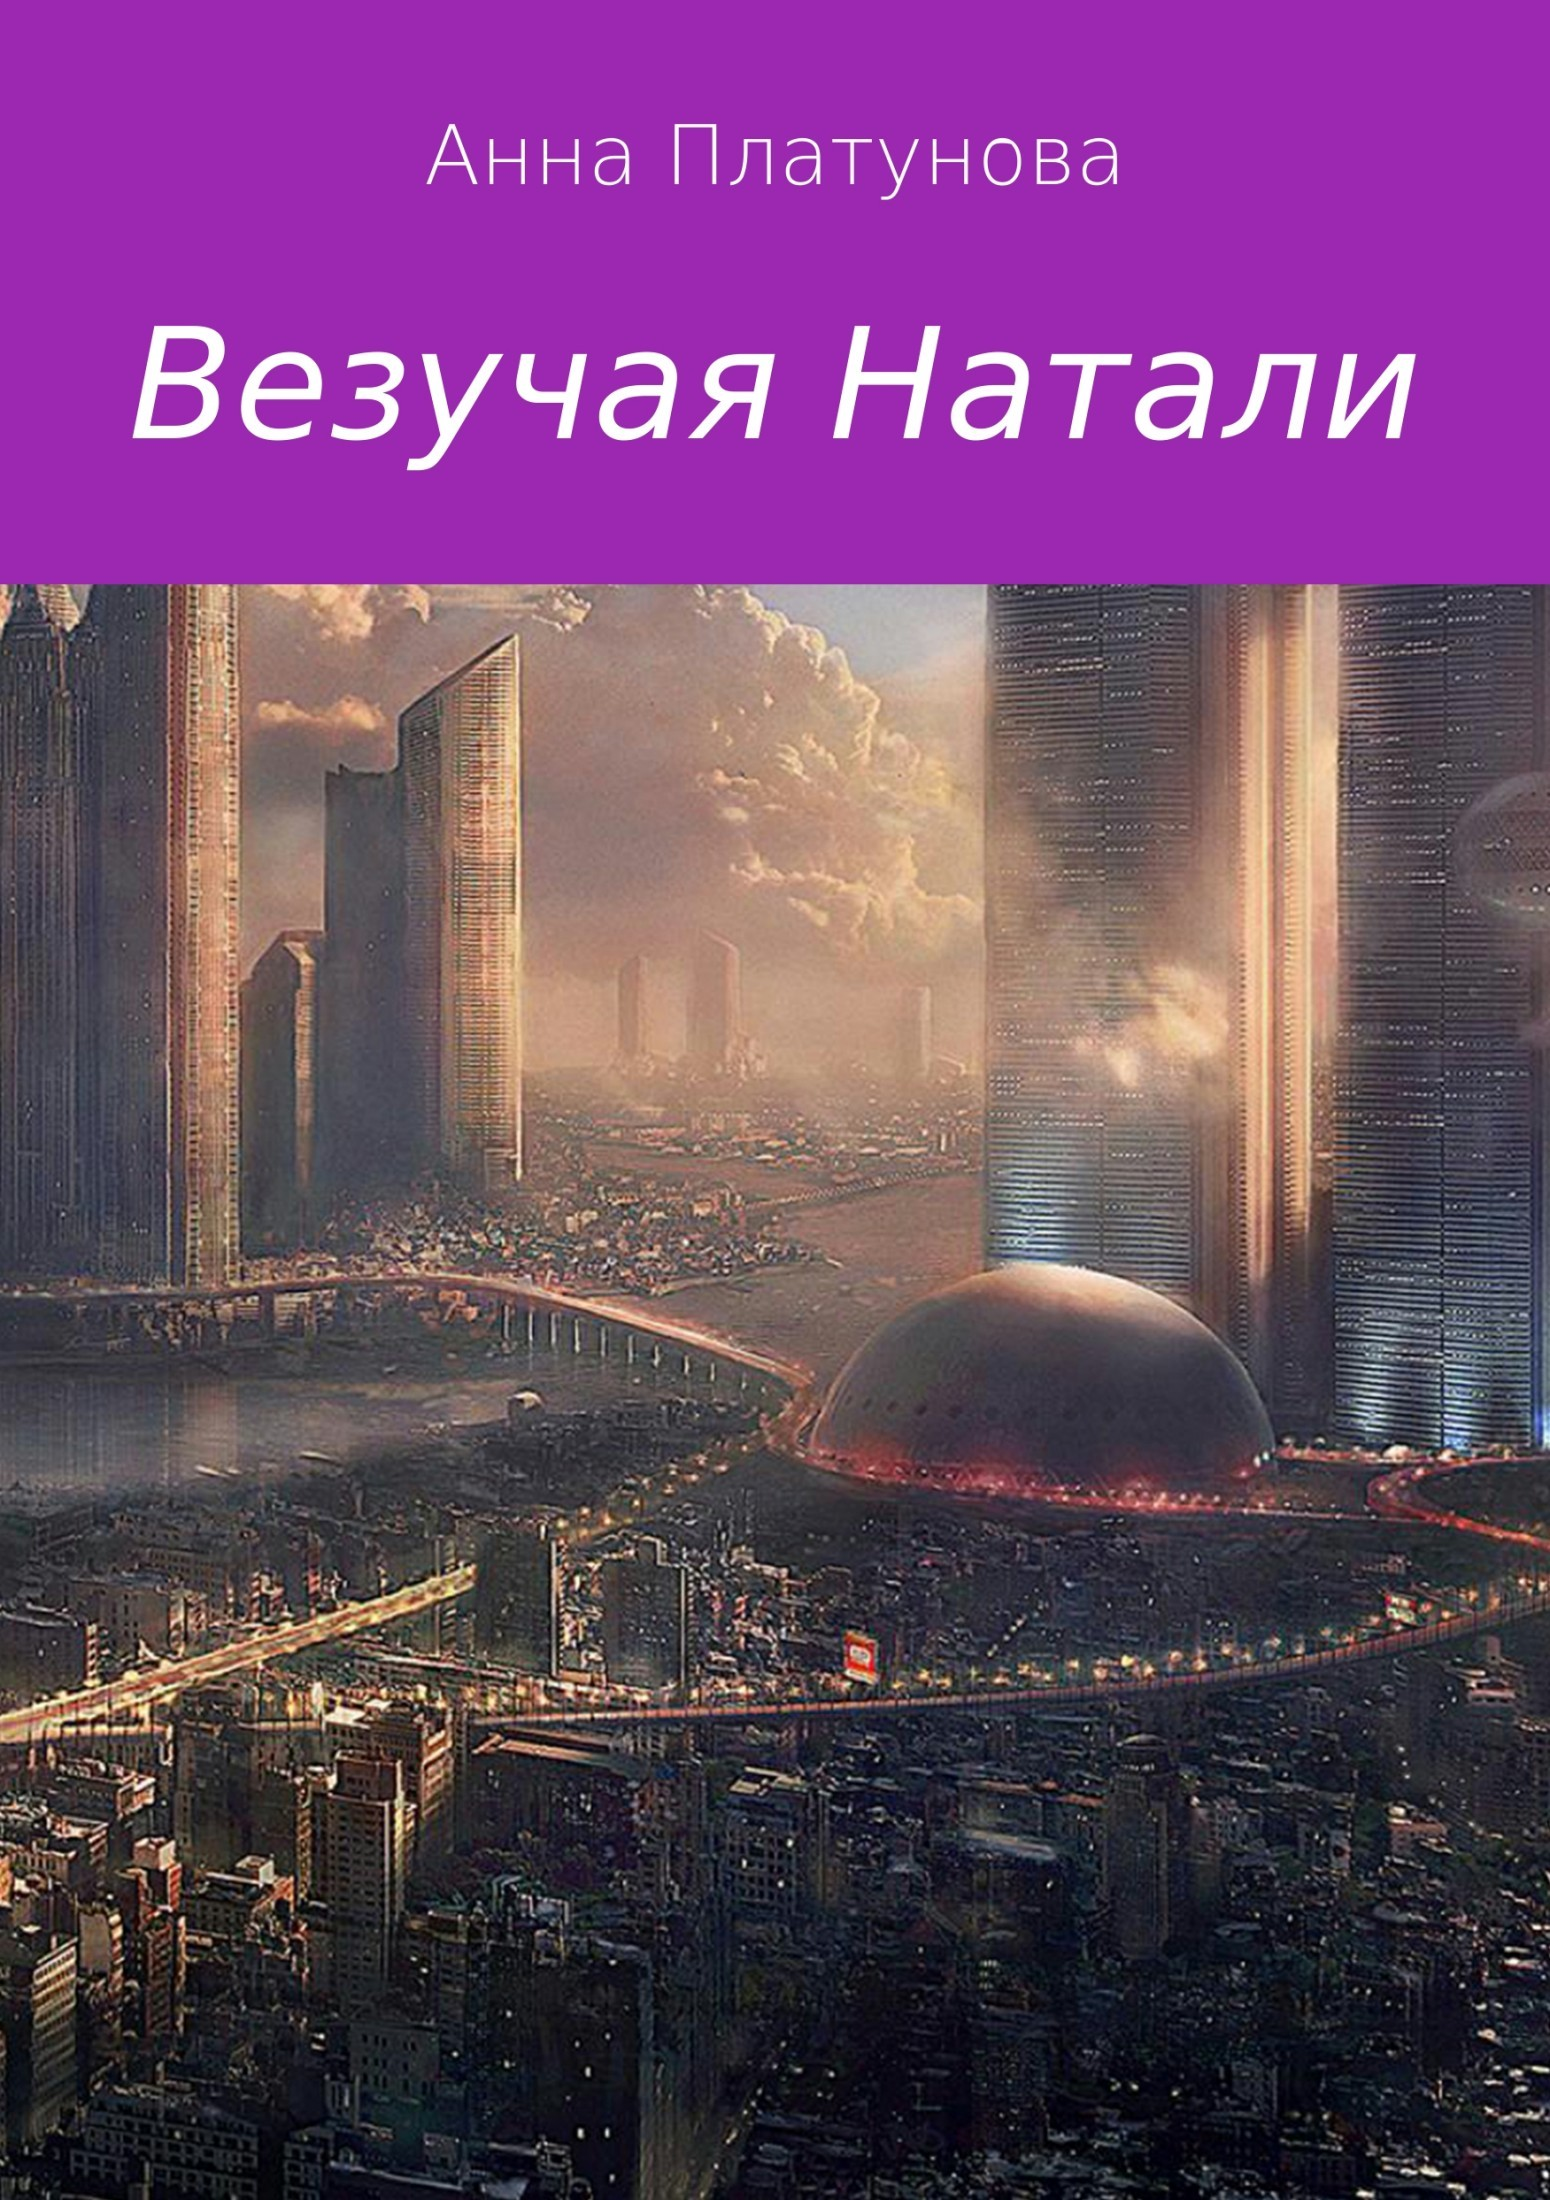 Анна Платунова - Везучая Натали